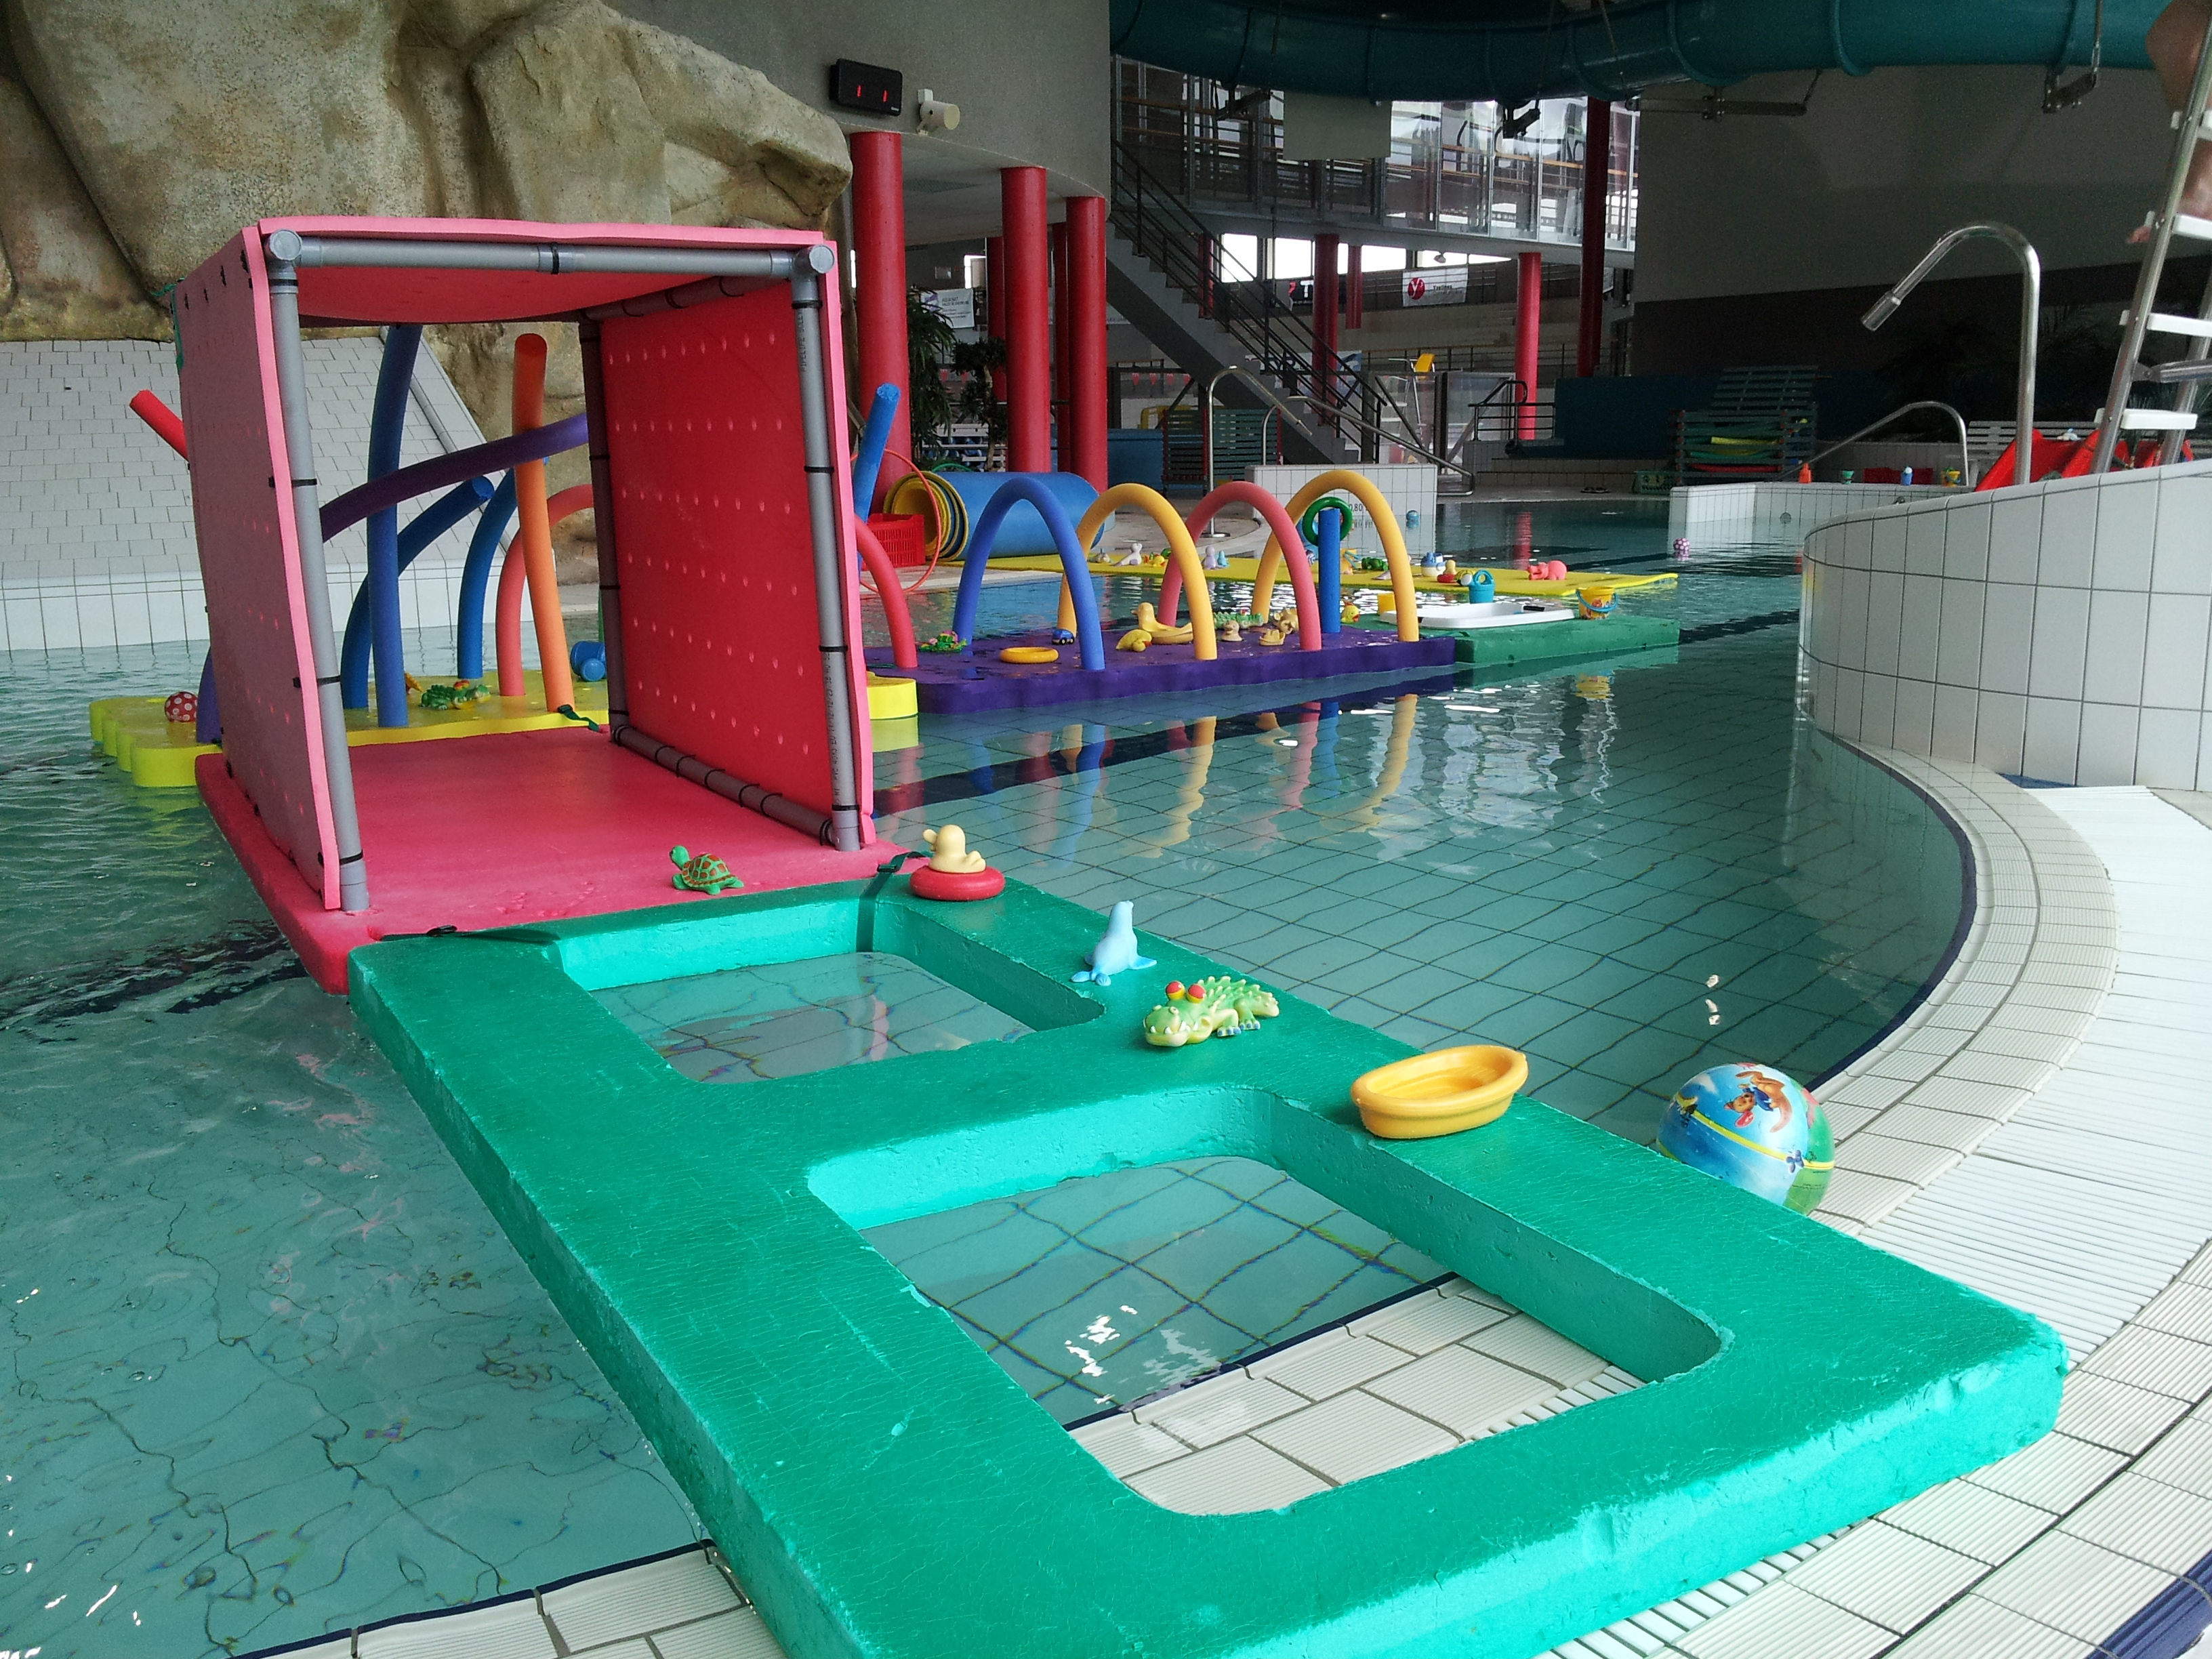 Aquanat piscine intercommunale de la vall e de for Piscine entre 2 immeubles